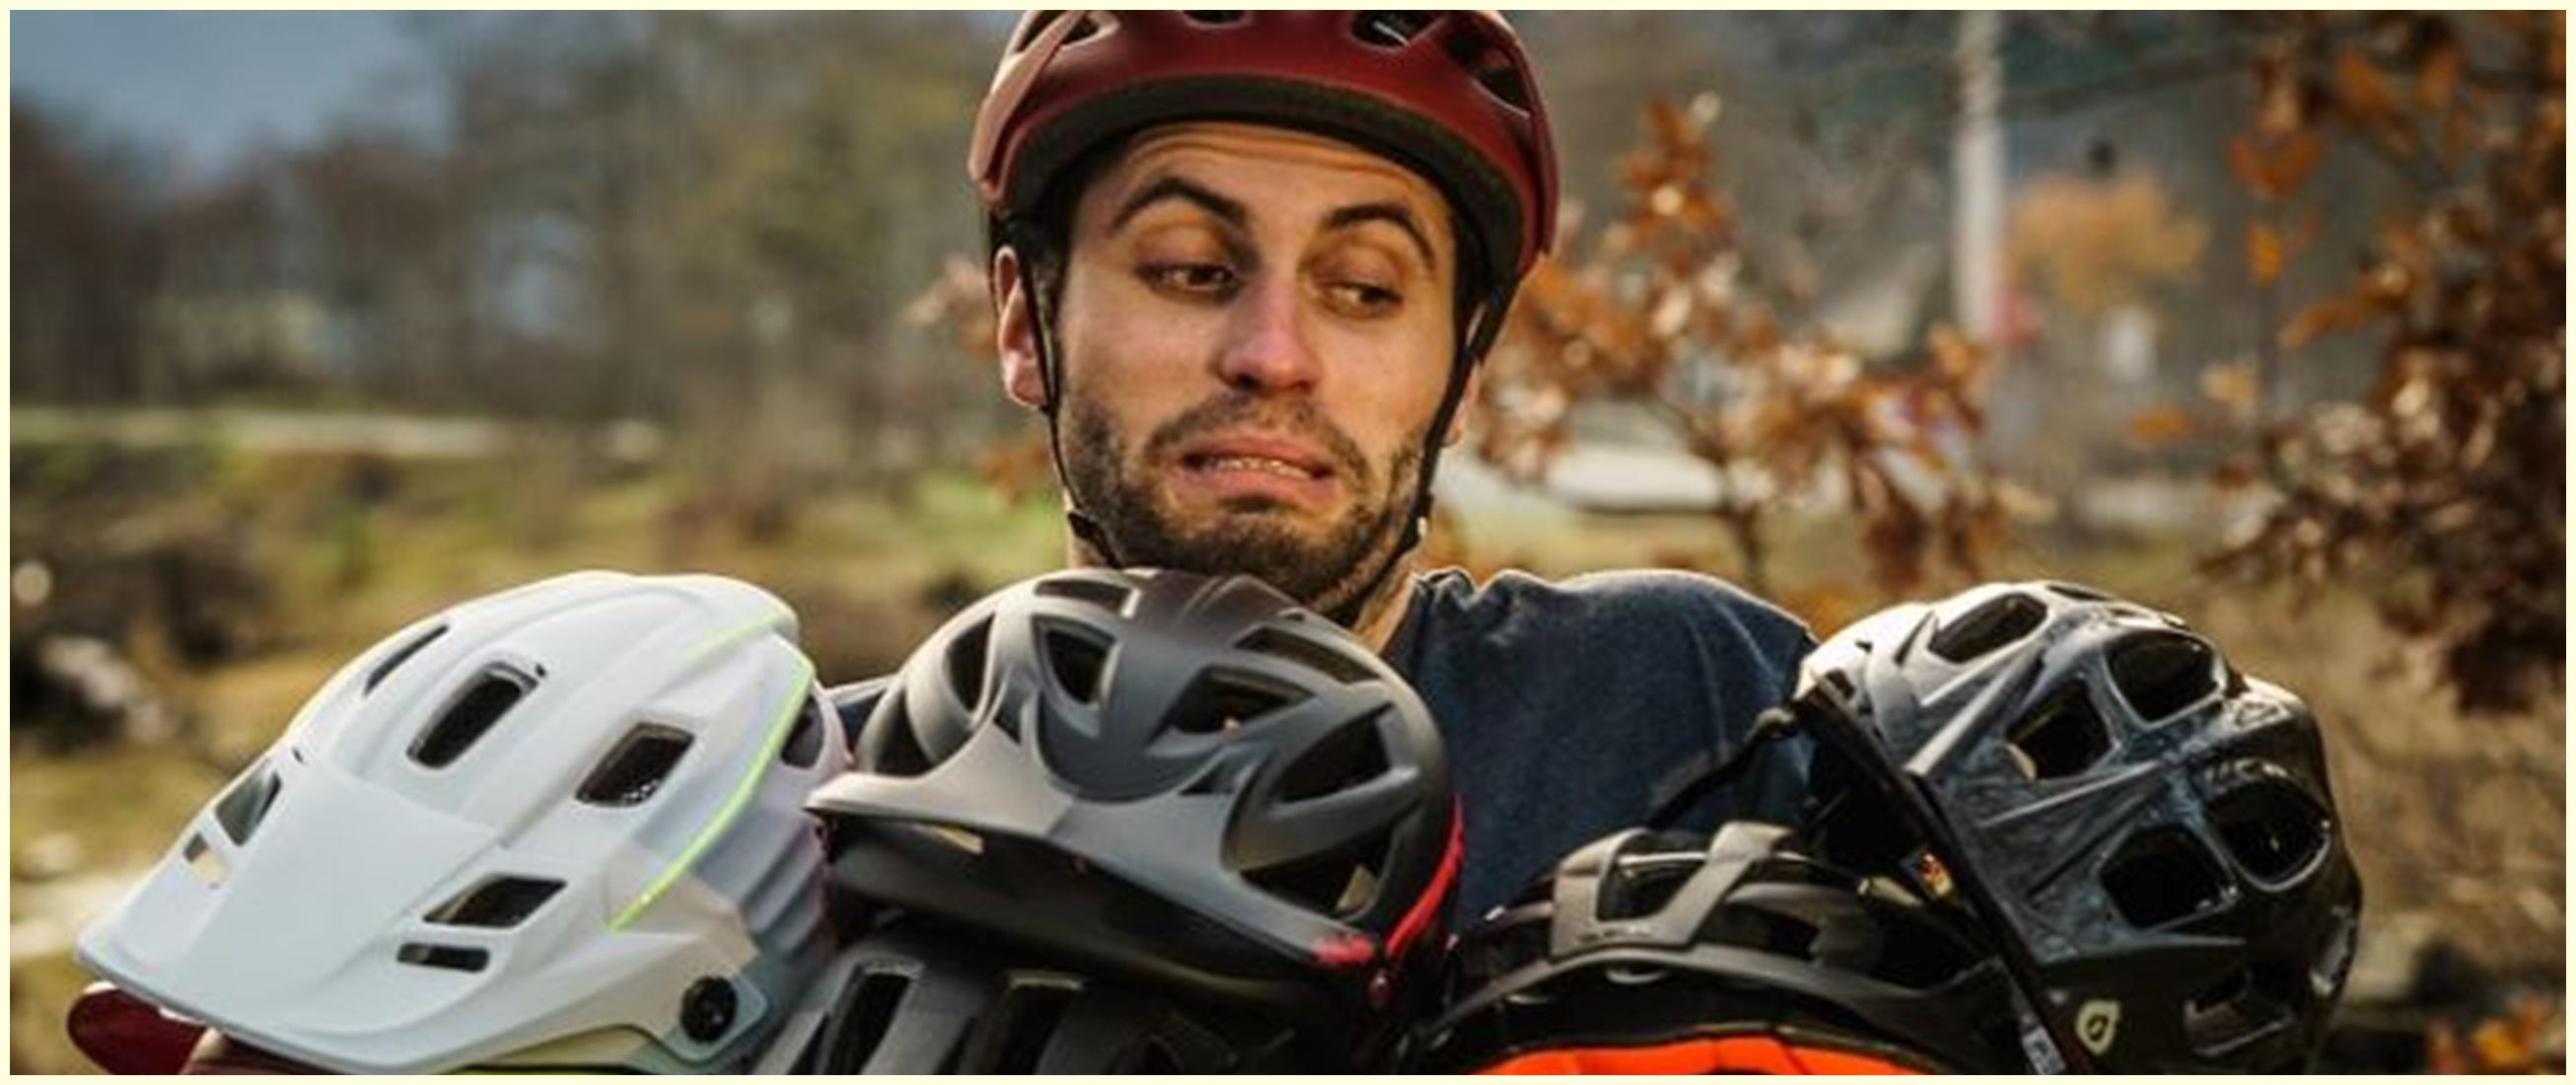 Model, harga, dan cara memilih helm sepeda MTB bagi pemula